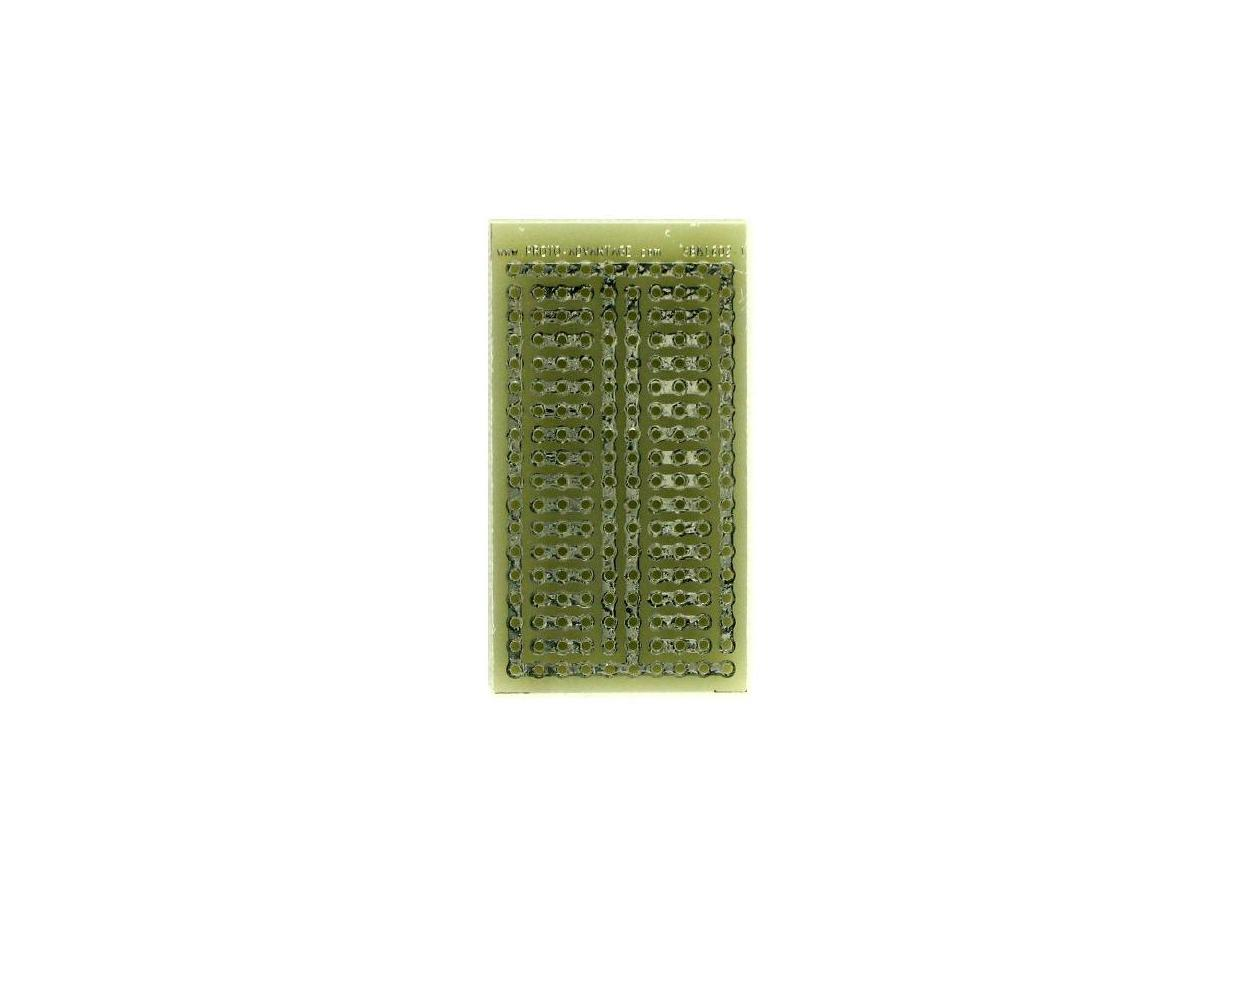 Solder Breadboard (16 row 2 column) 0